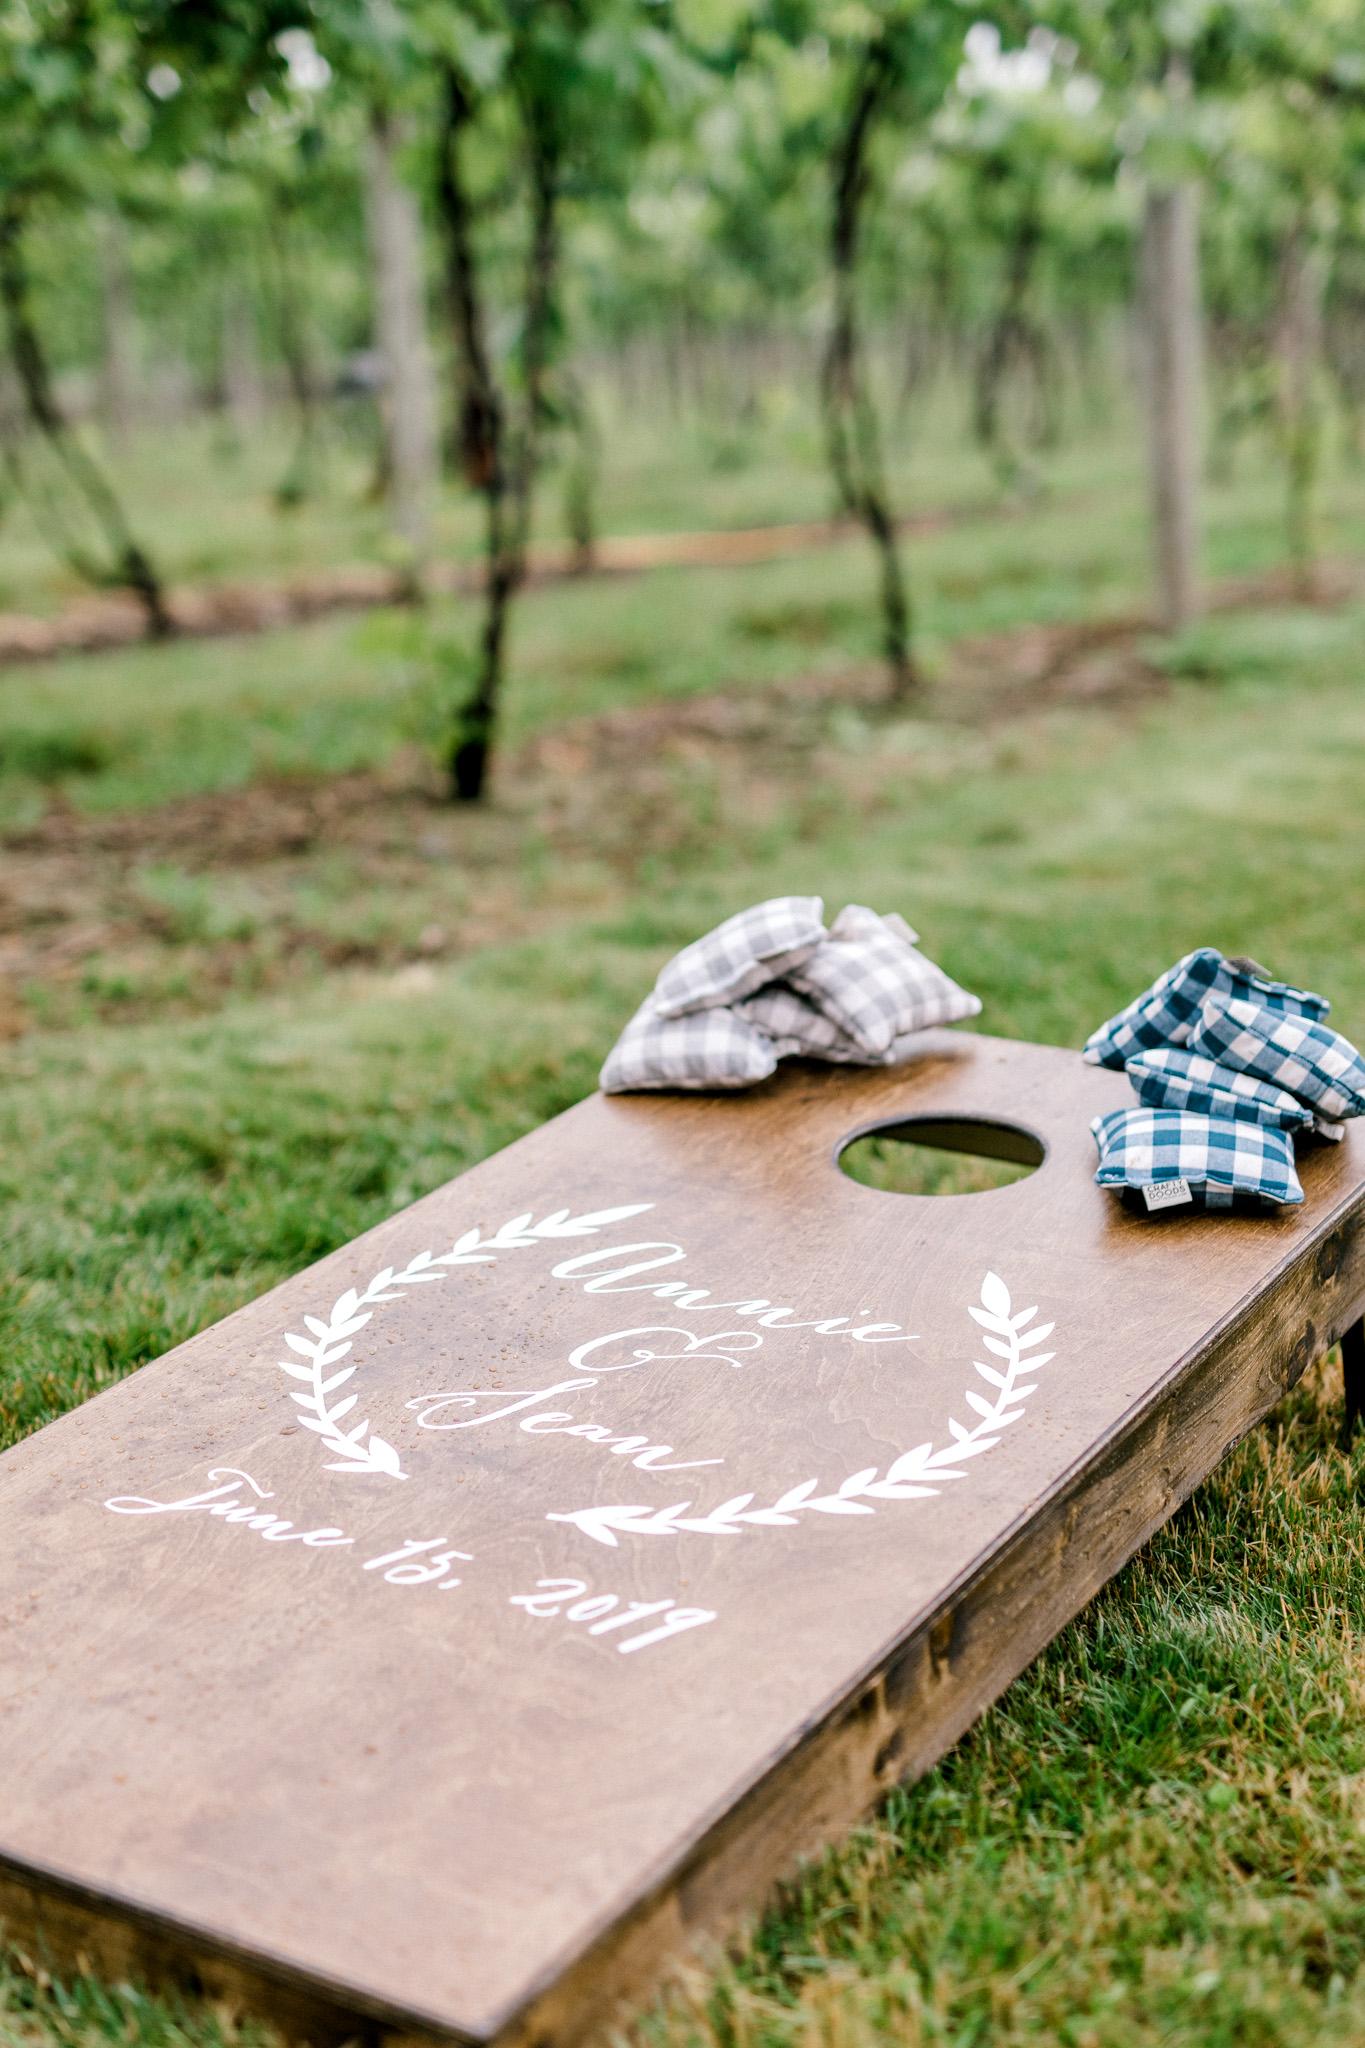 Rainy Vineyard Wedding in Southern Michigan | 12 Corners Vineyard Wedding | Beach Wedding in Michigan